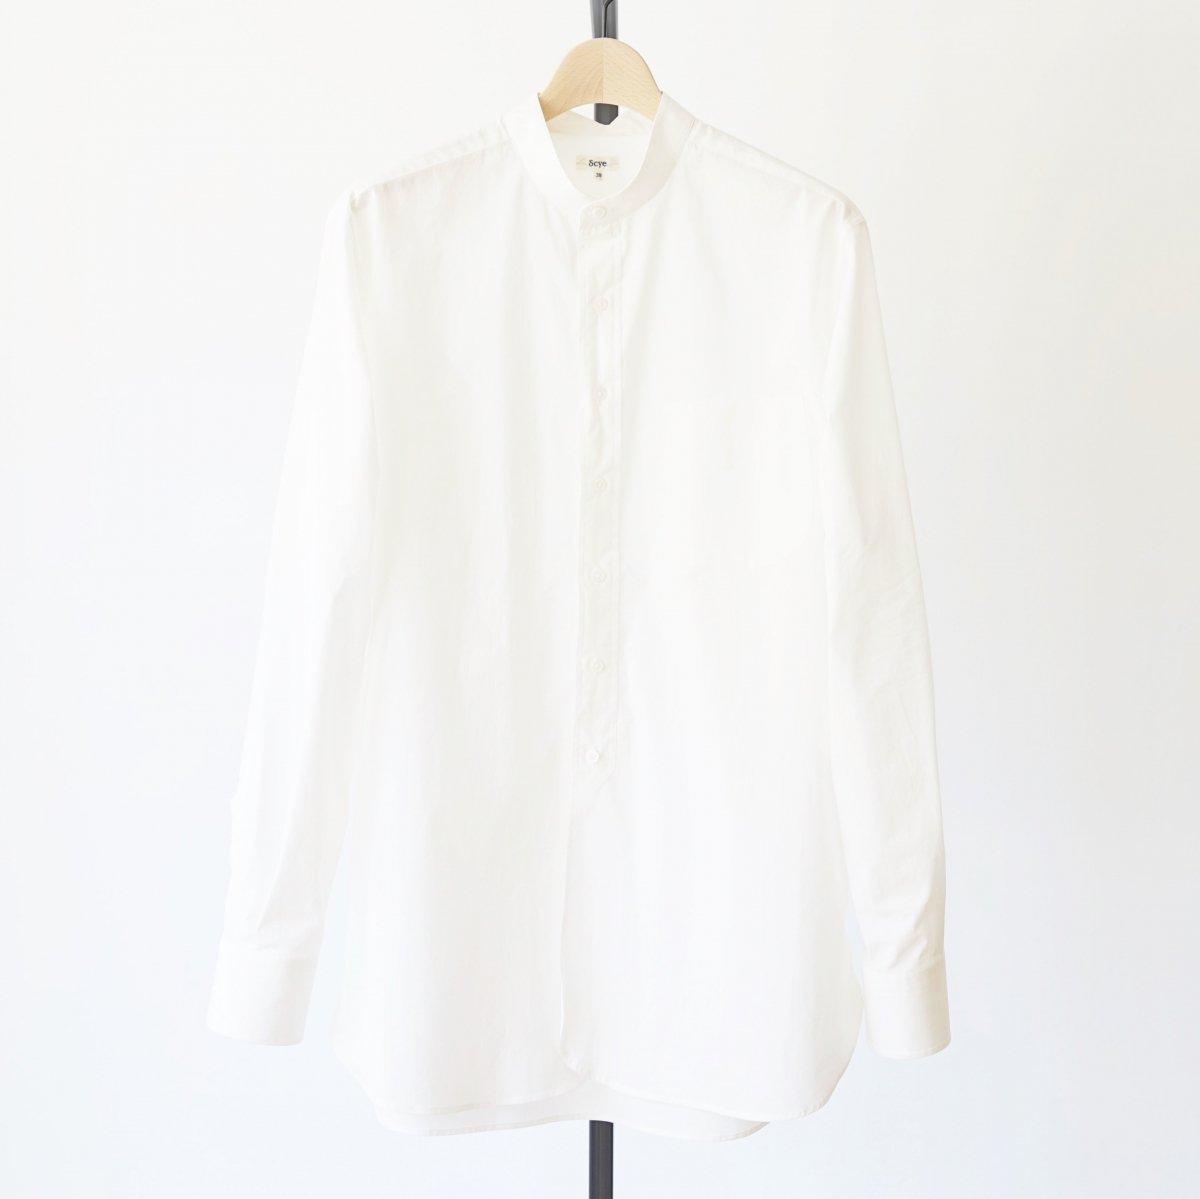 【Scye】WASHED POPLIN GRANDAD COLLAR SHIRT - OFF WHITE